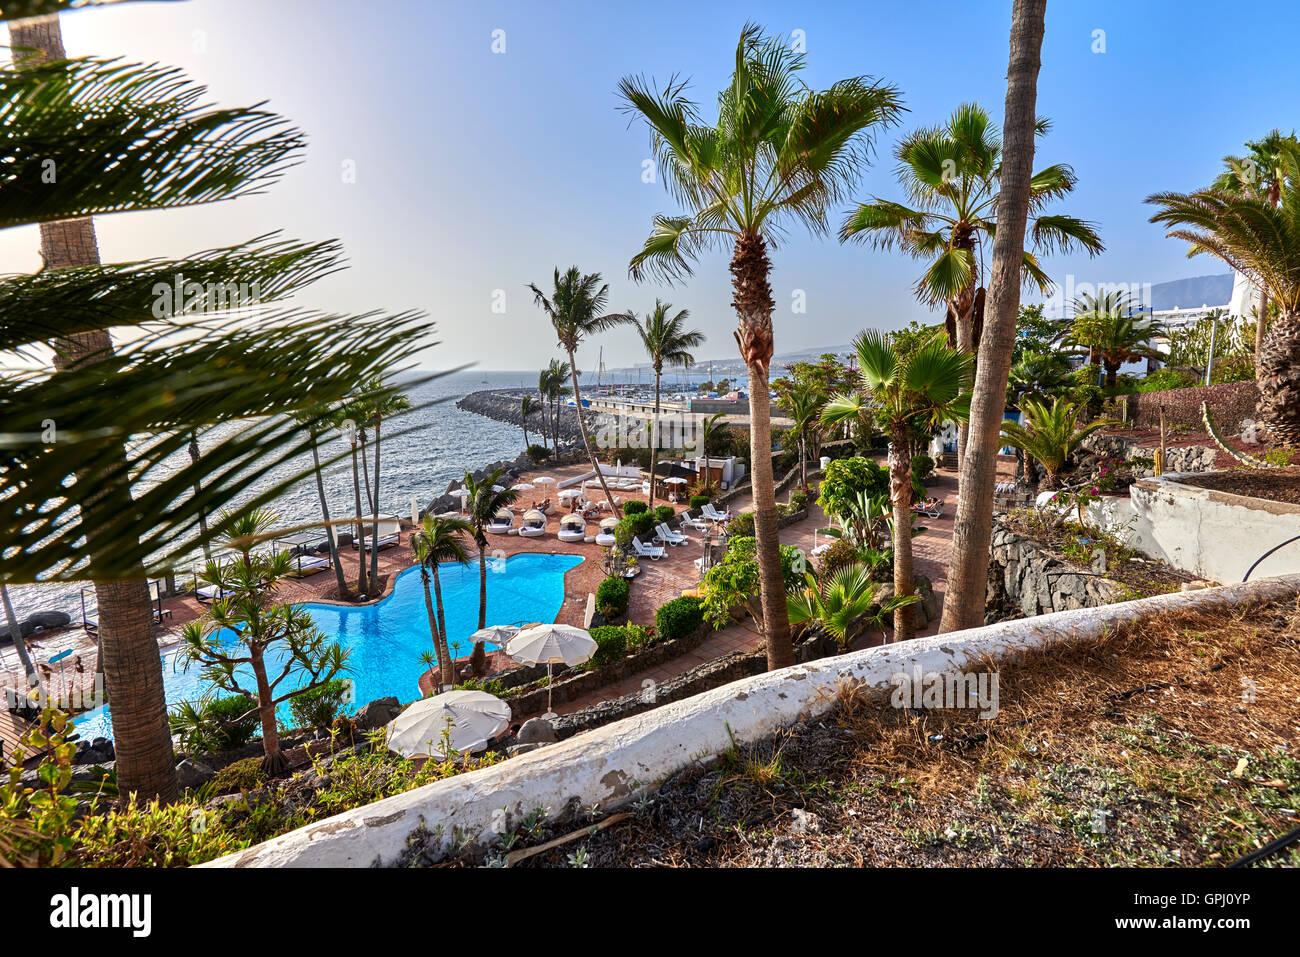 Hotel Jardin Tropical Costa Adeje Tenerife Stock Photo 117180554